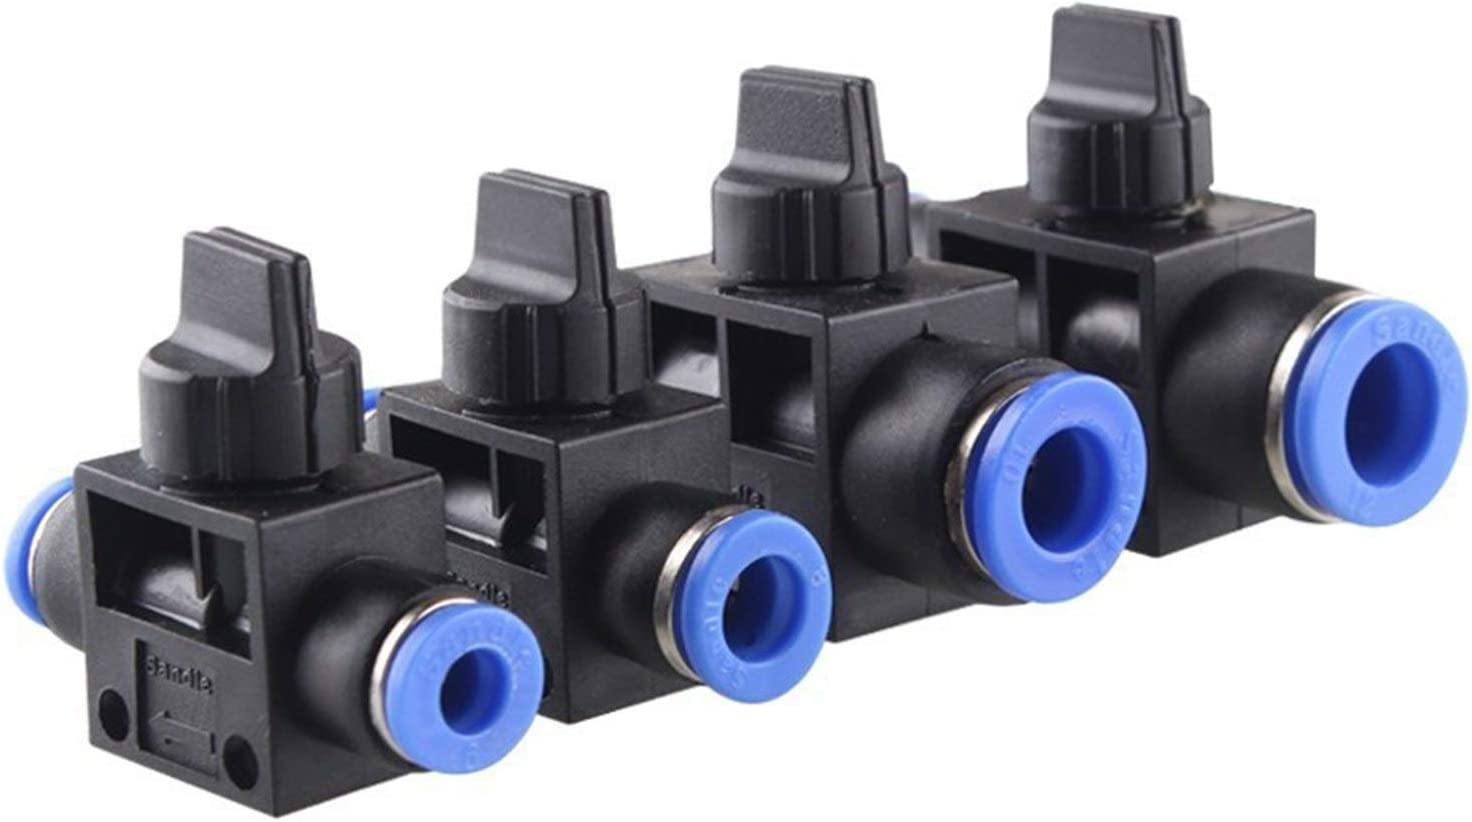 Terminal connectors 10Pcs Ranking TOP19 price Pneumatic Parts 6mm 8mm 4mm 10mm 12mm